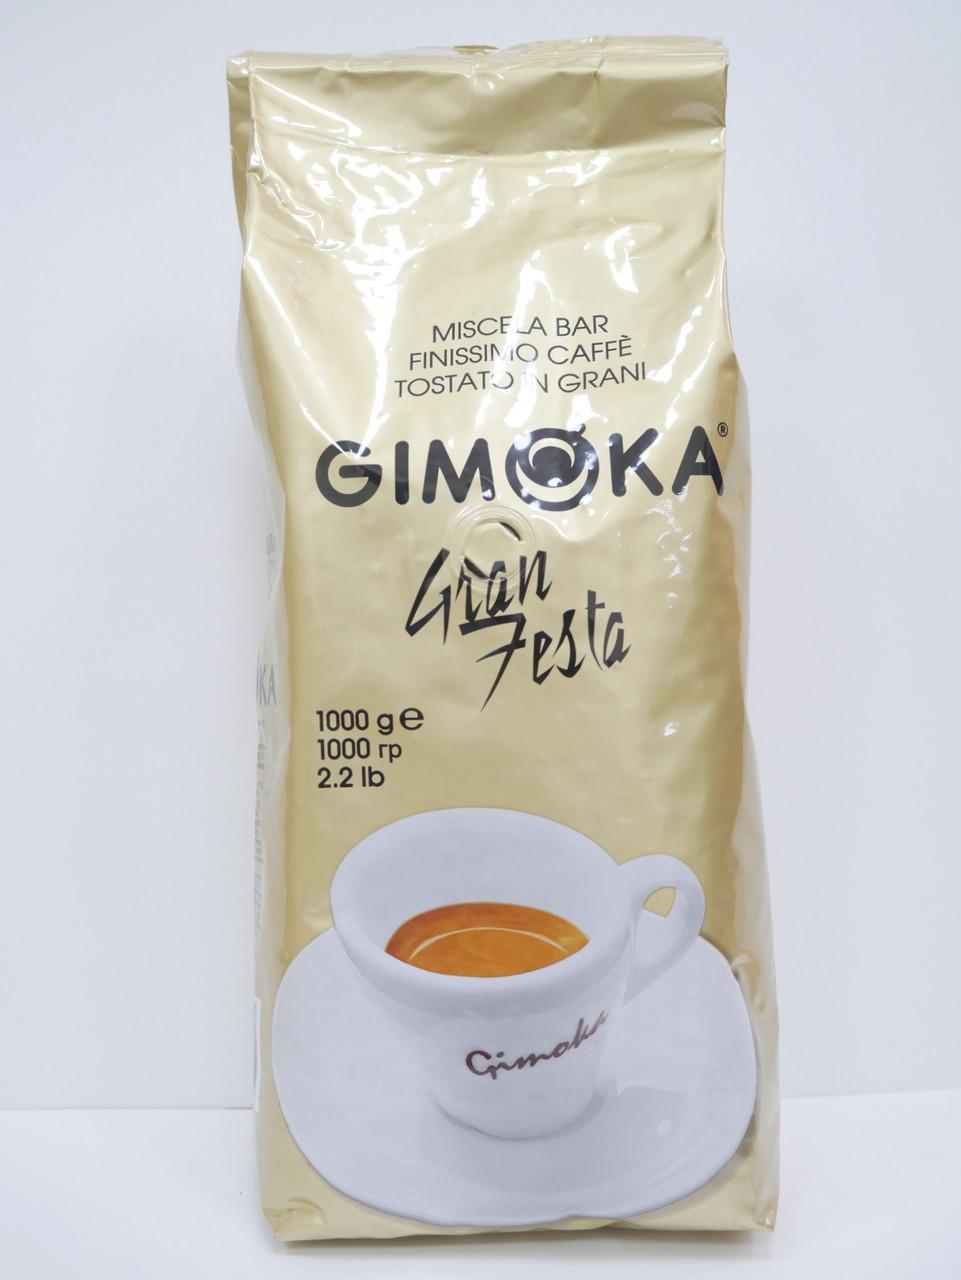 Кофе в зернах Gimoka Gran Festa 1 кг (ОПТ от 6 пачек). Оригинал.